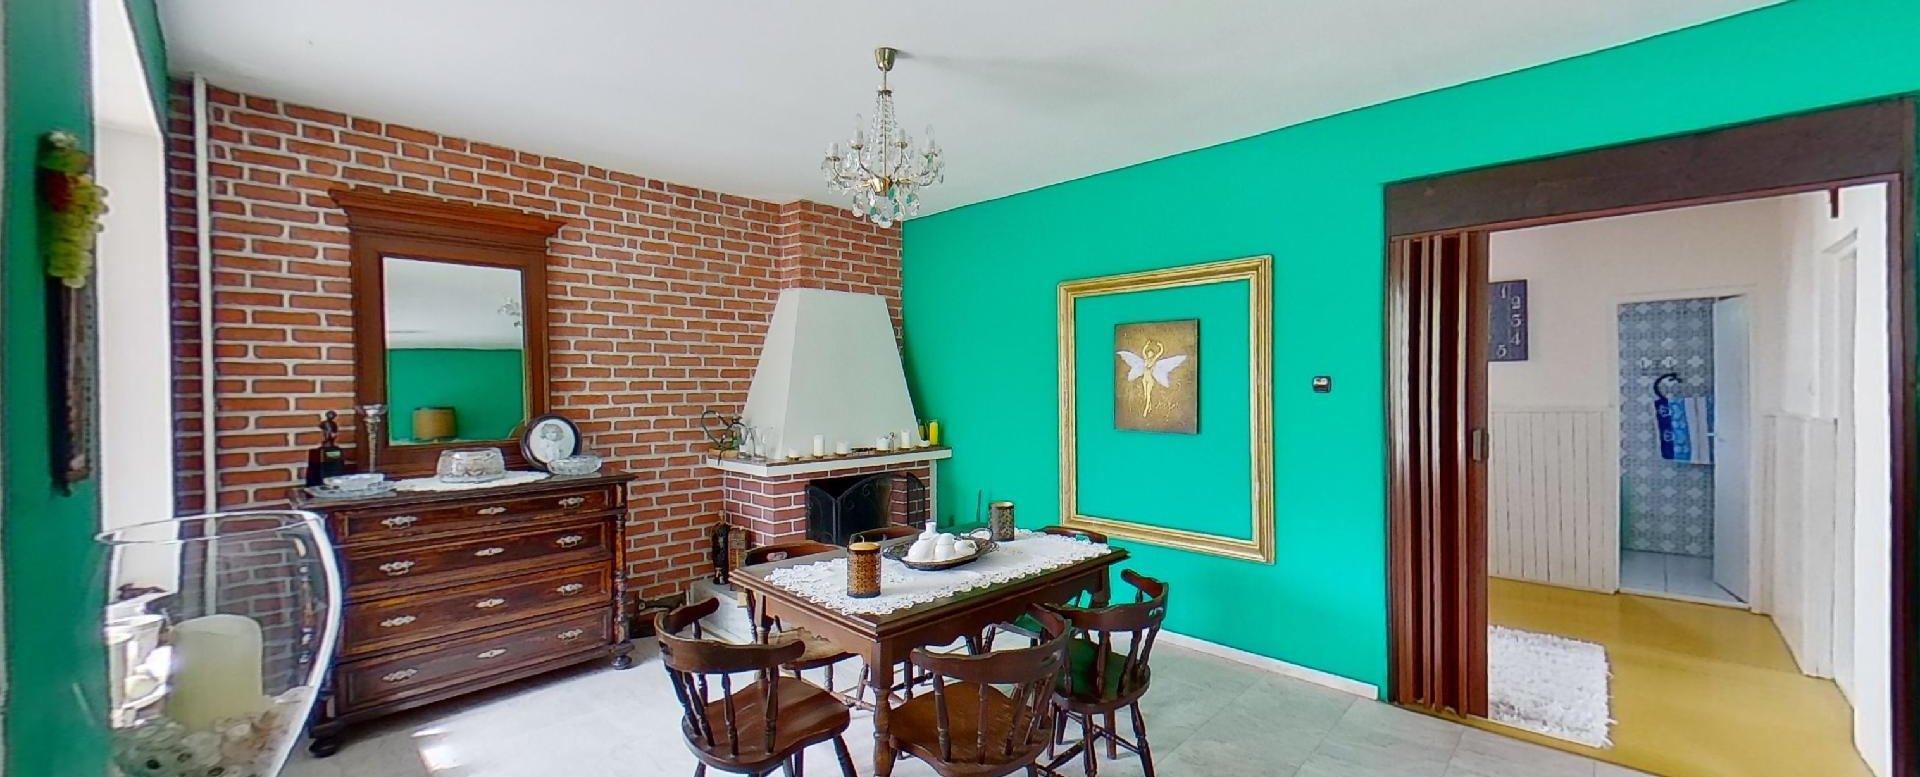 jedáleň s krbom v obývacej izbe